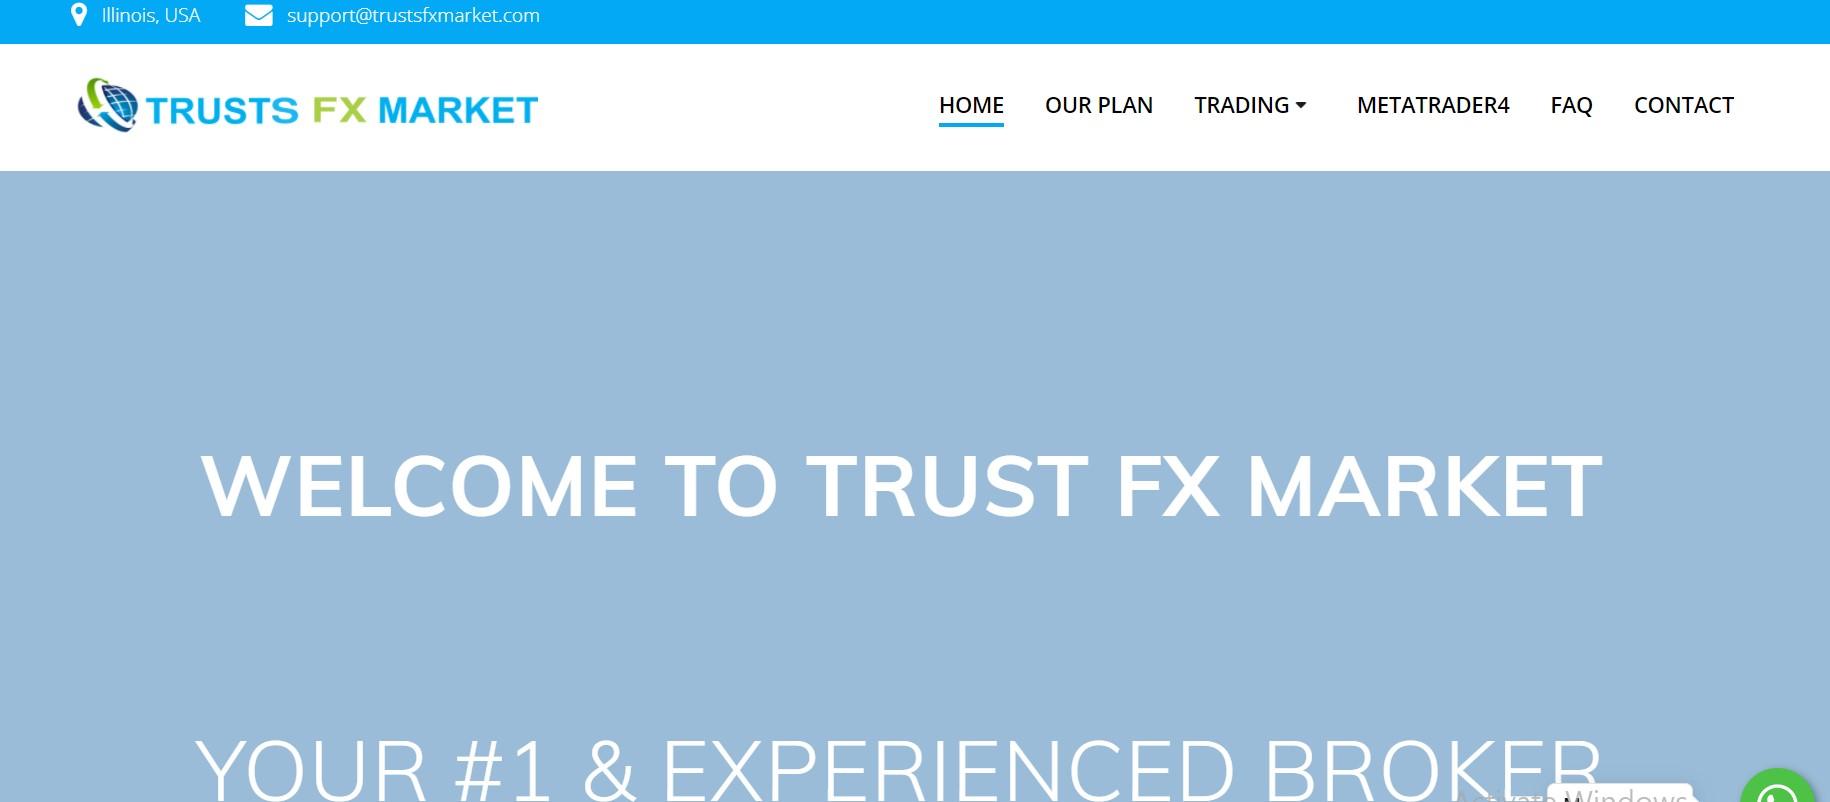 TrustsFXMarket website